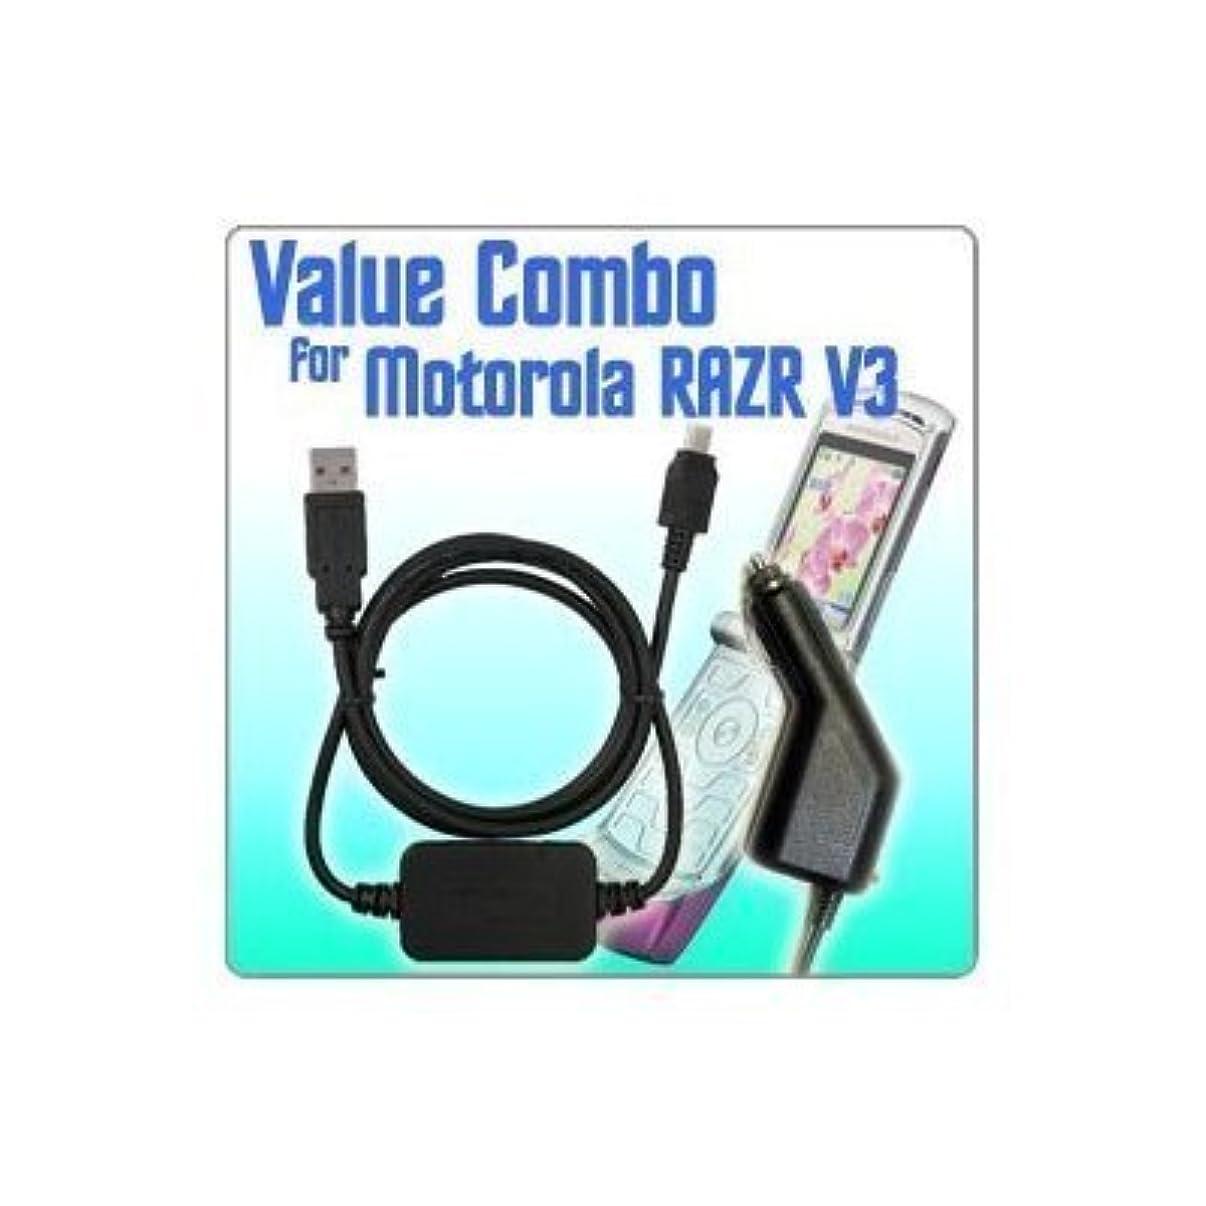 Value Combo for Motorola Razr V3 - Car Charger + USB Data Cable